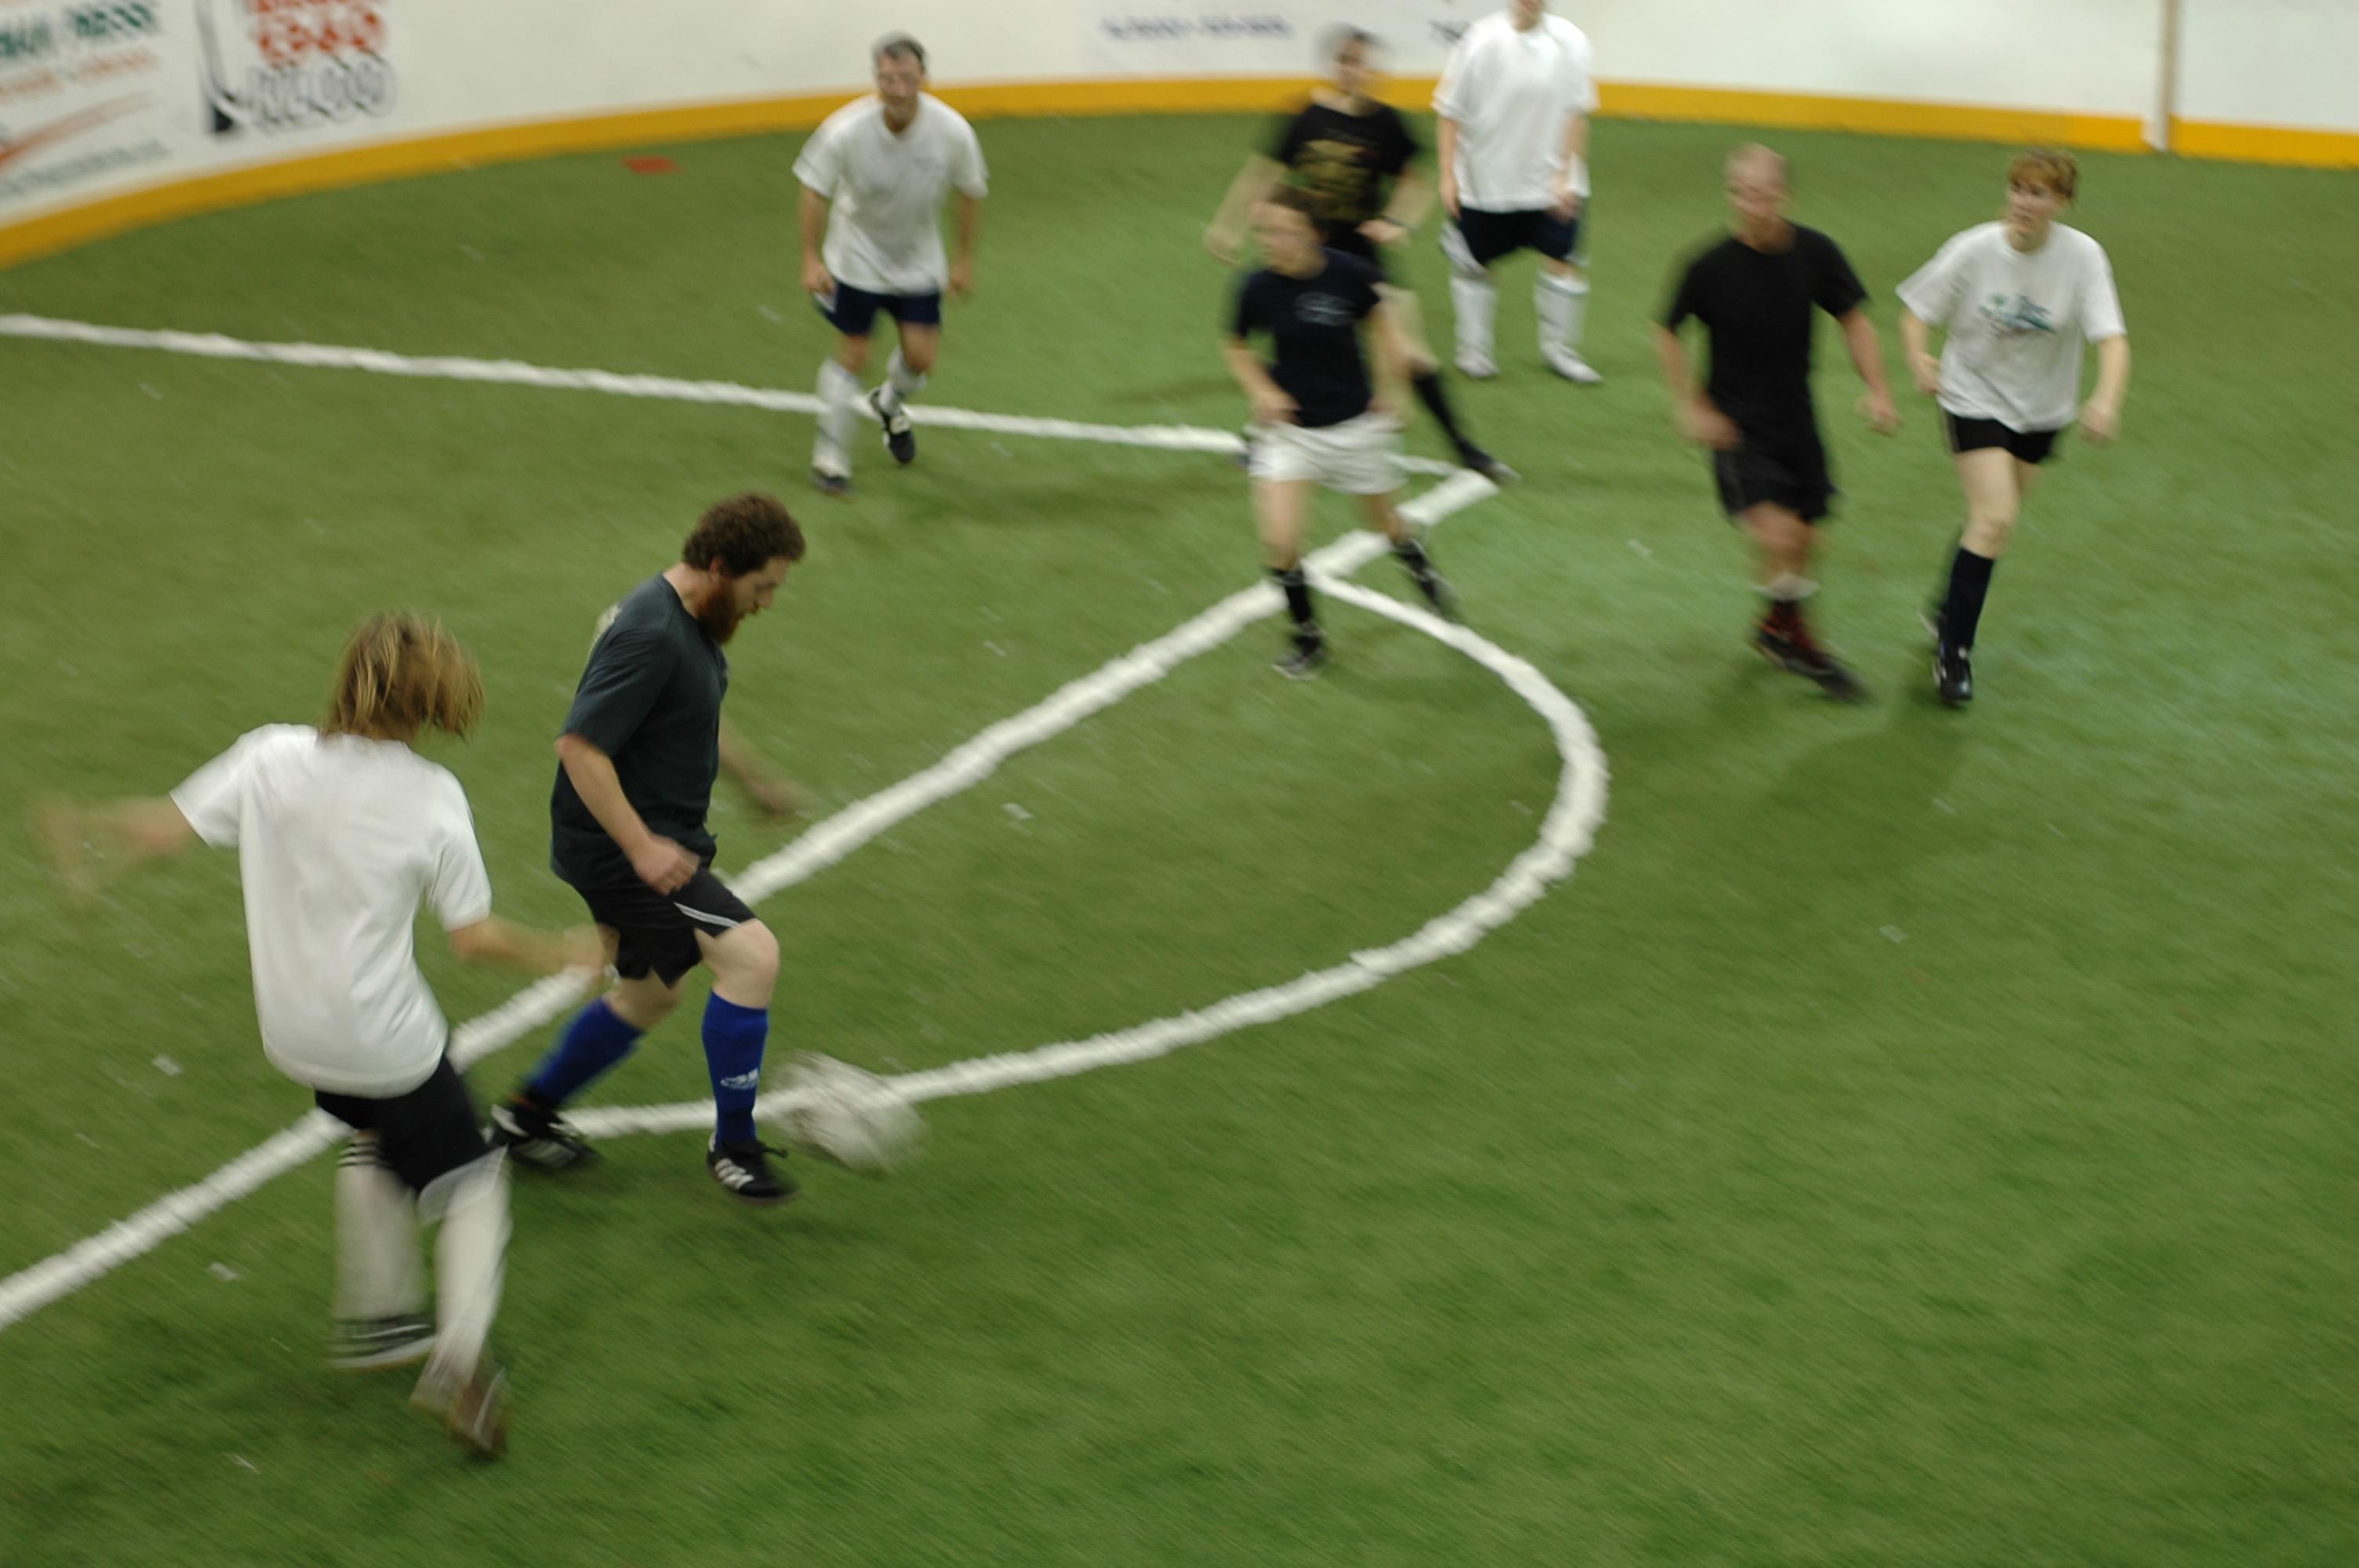 Indoor Cr Soccer Shoes White Mercurys